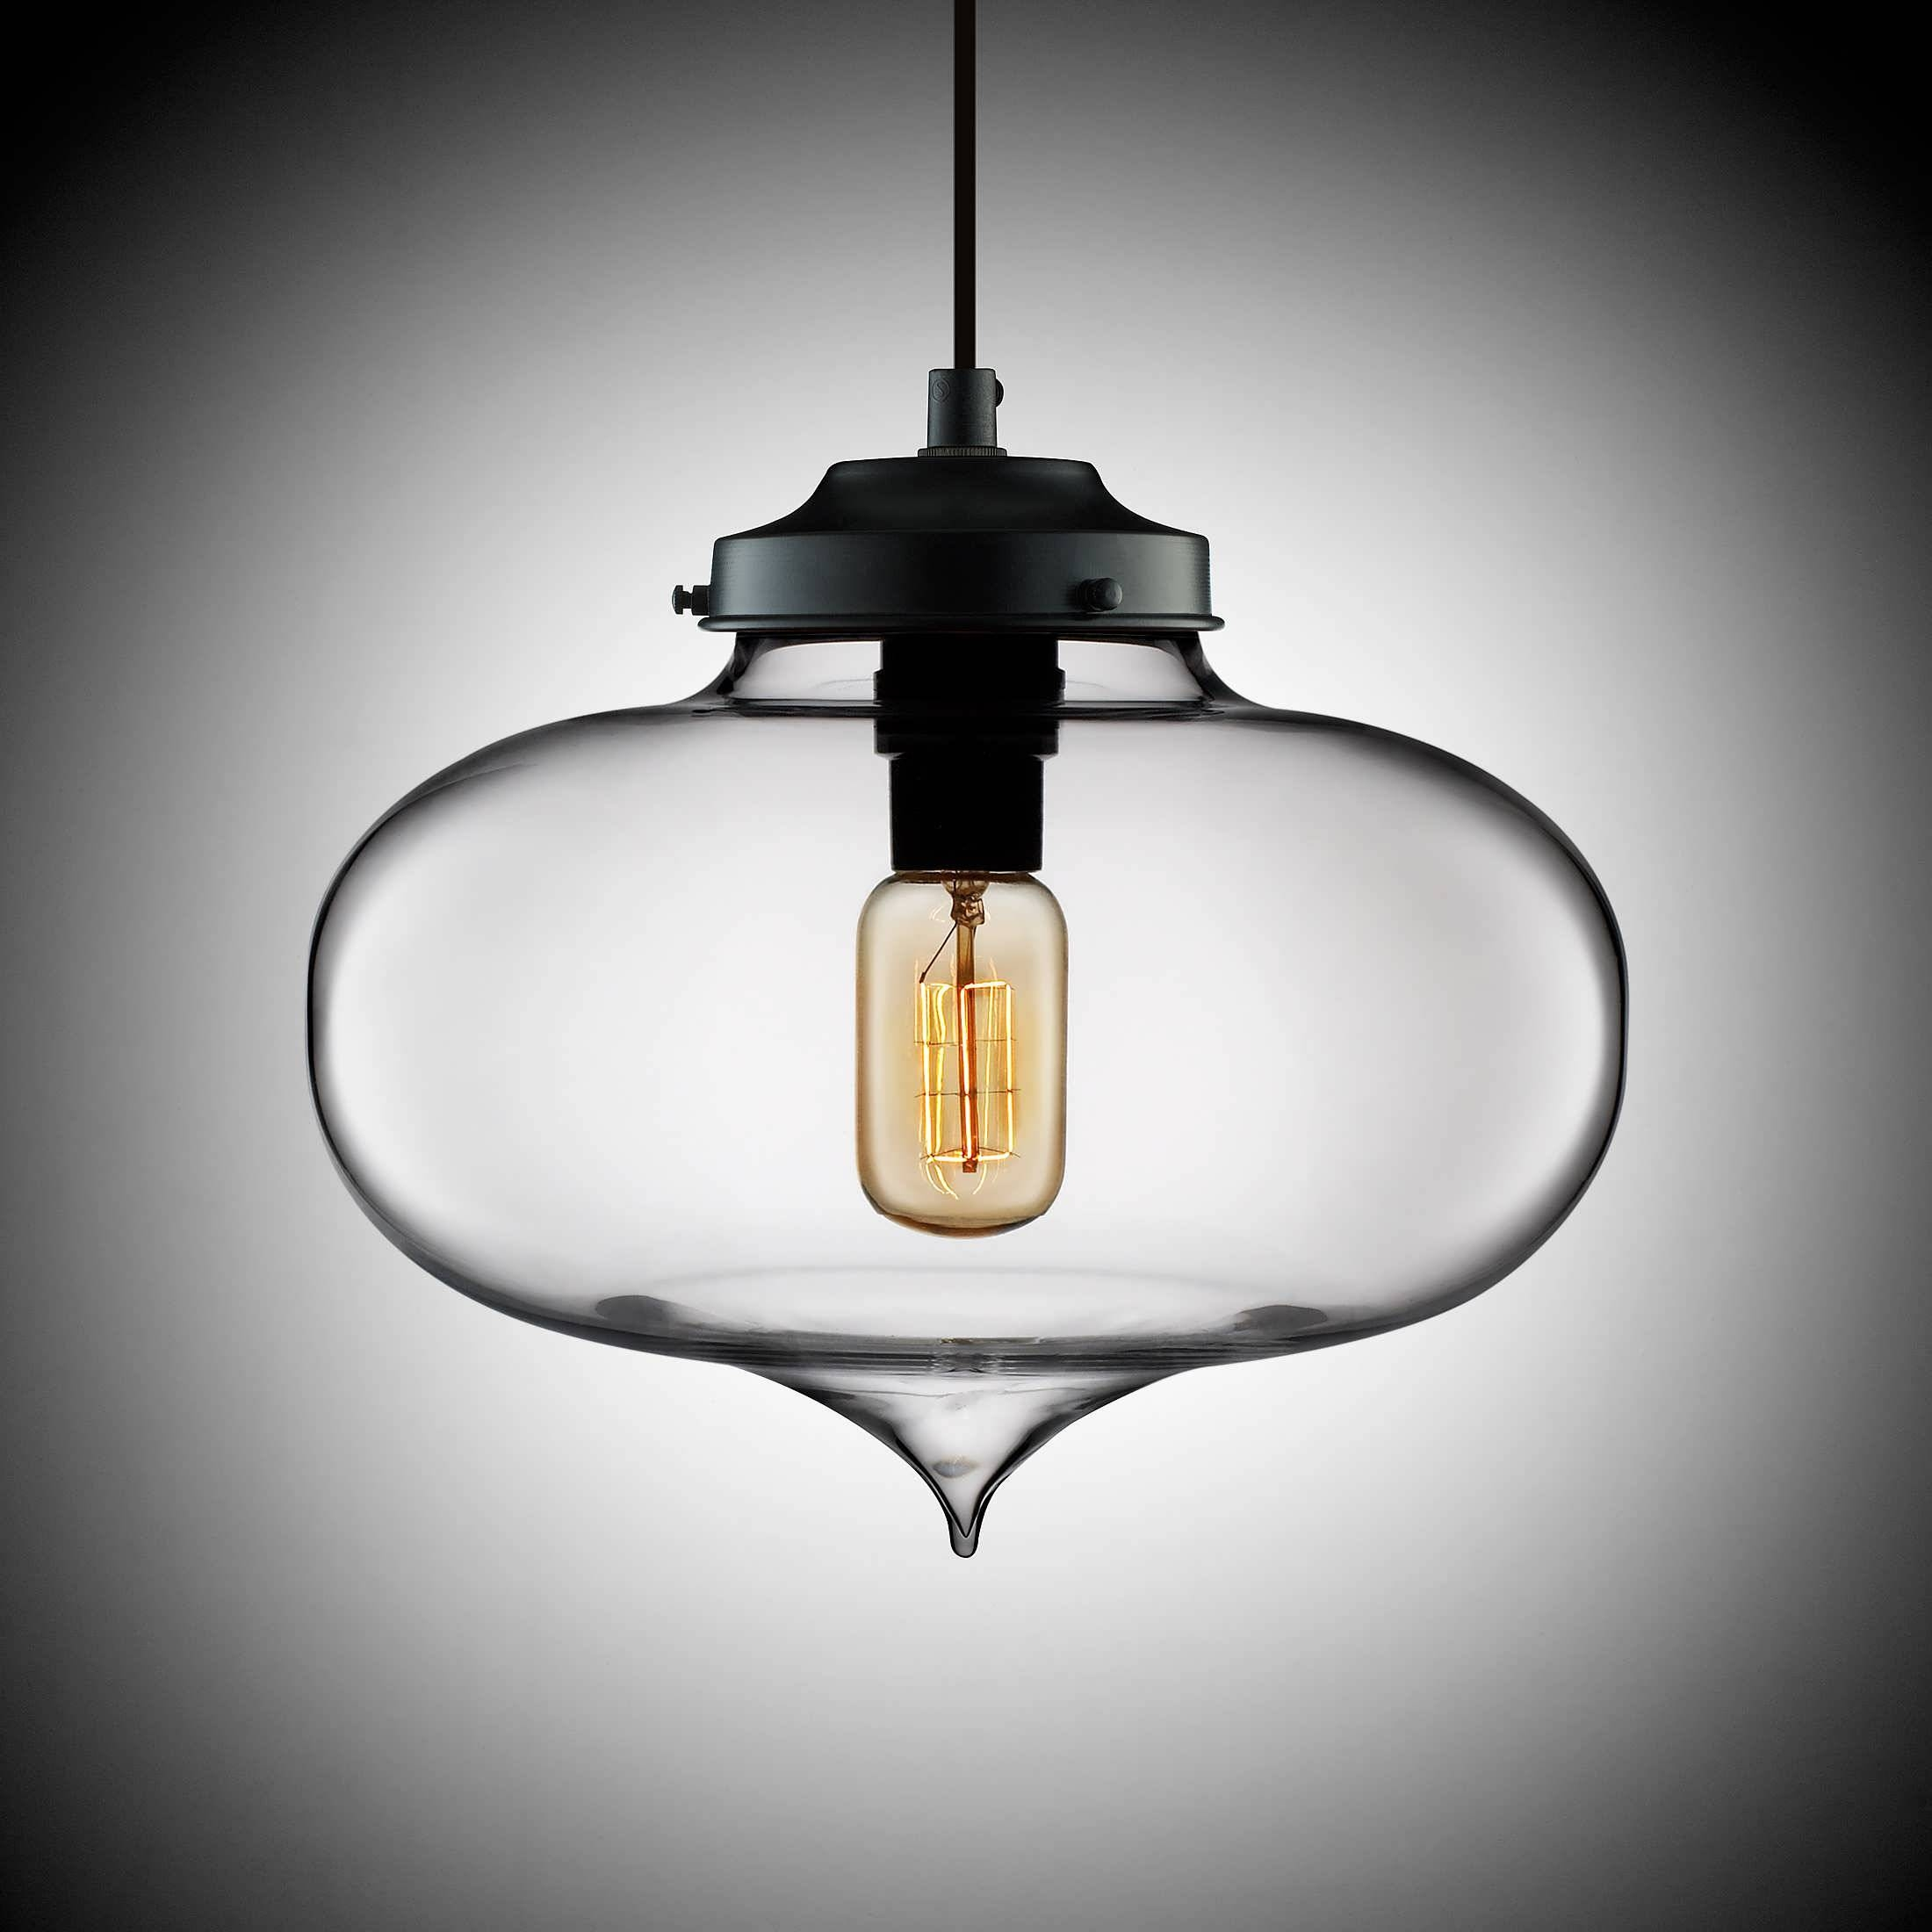 Chandelier : Star Pendant Light Kitchen Pendant Lighting Dining In Square Pendant Light Fixtures (View 14 of 15)